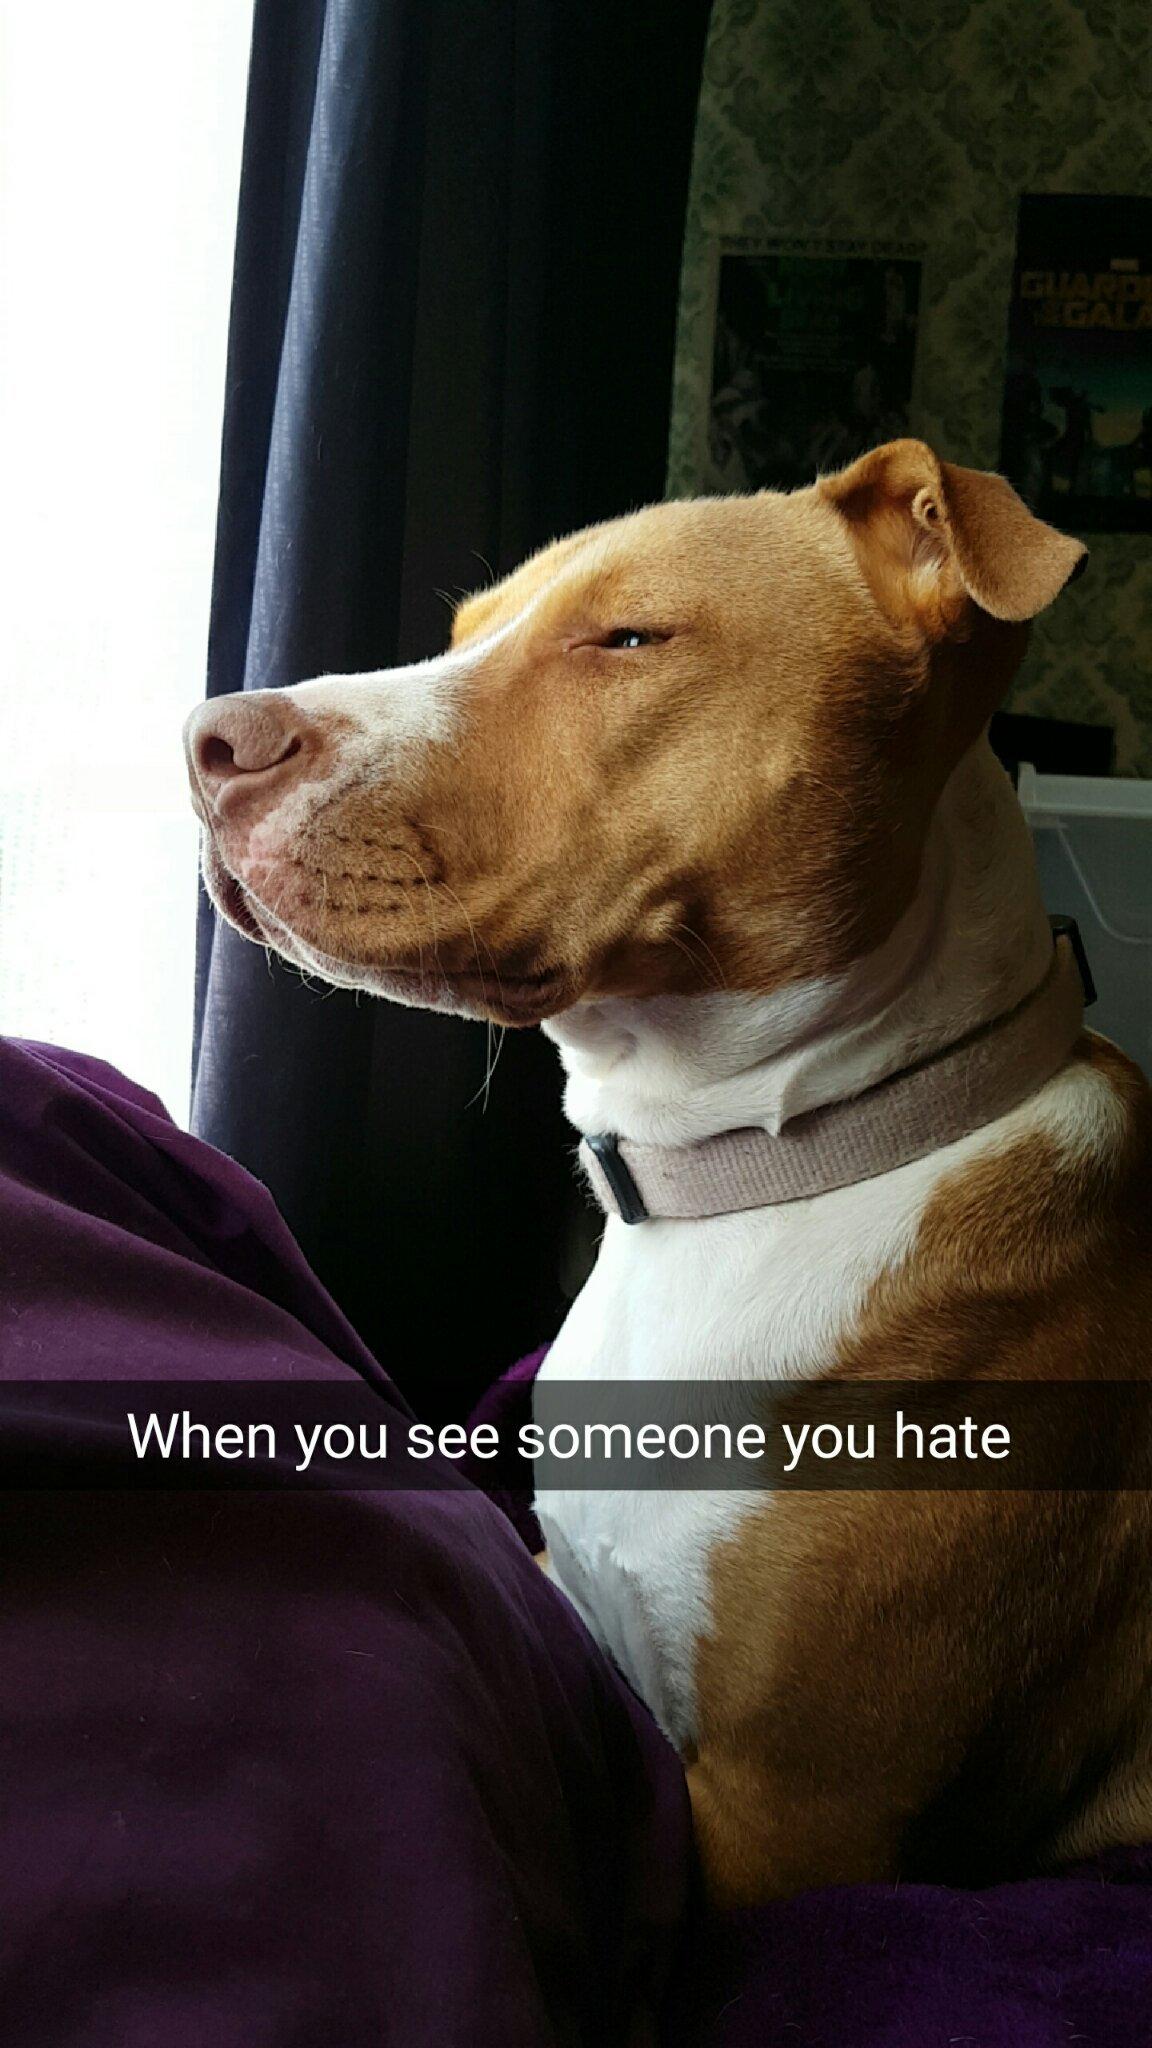 My dog LET IT PASS - meme